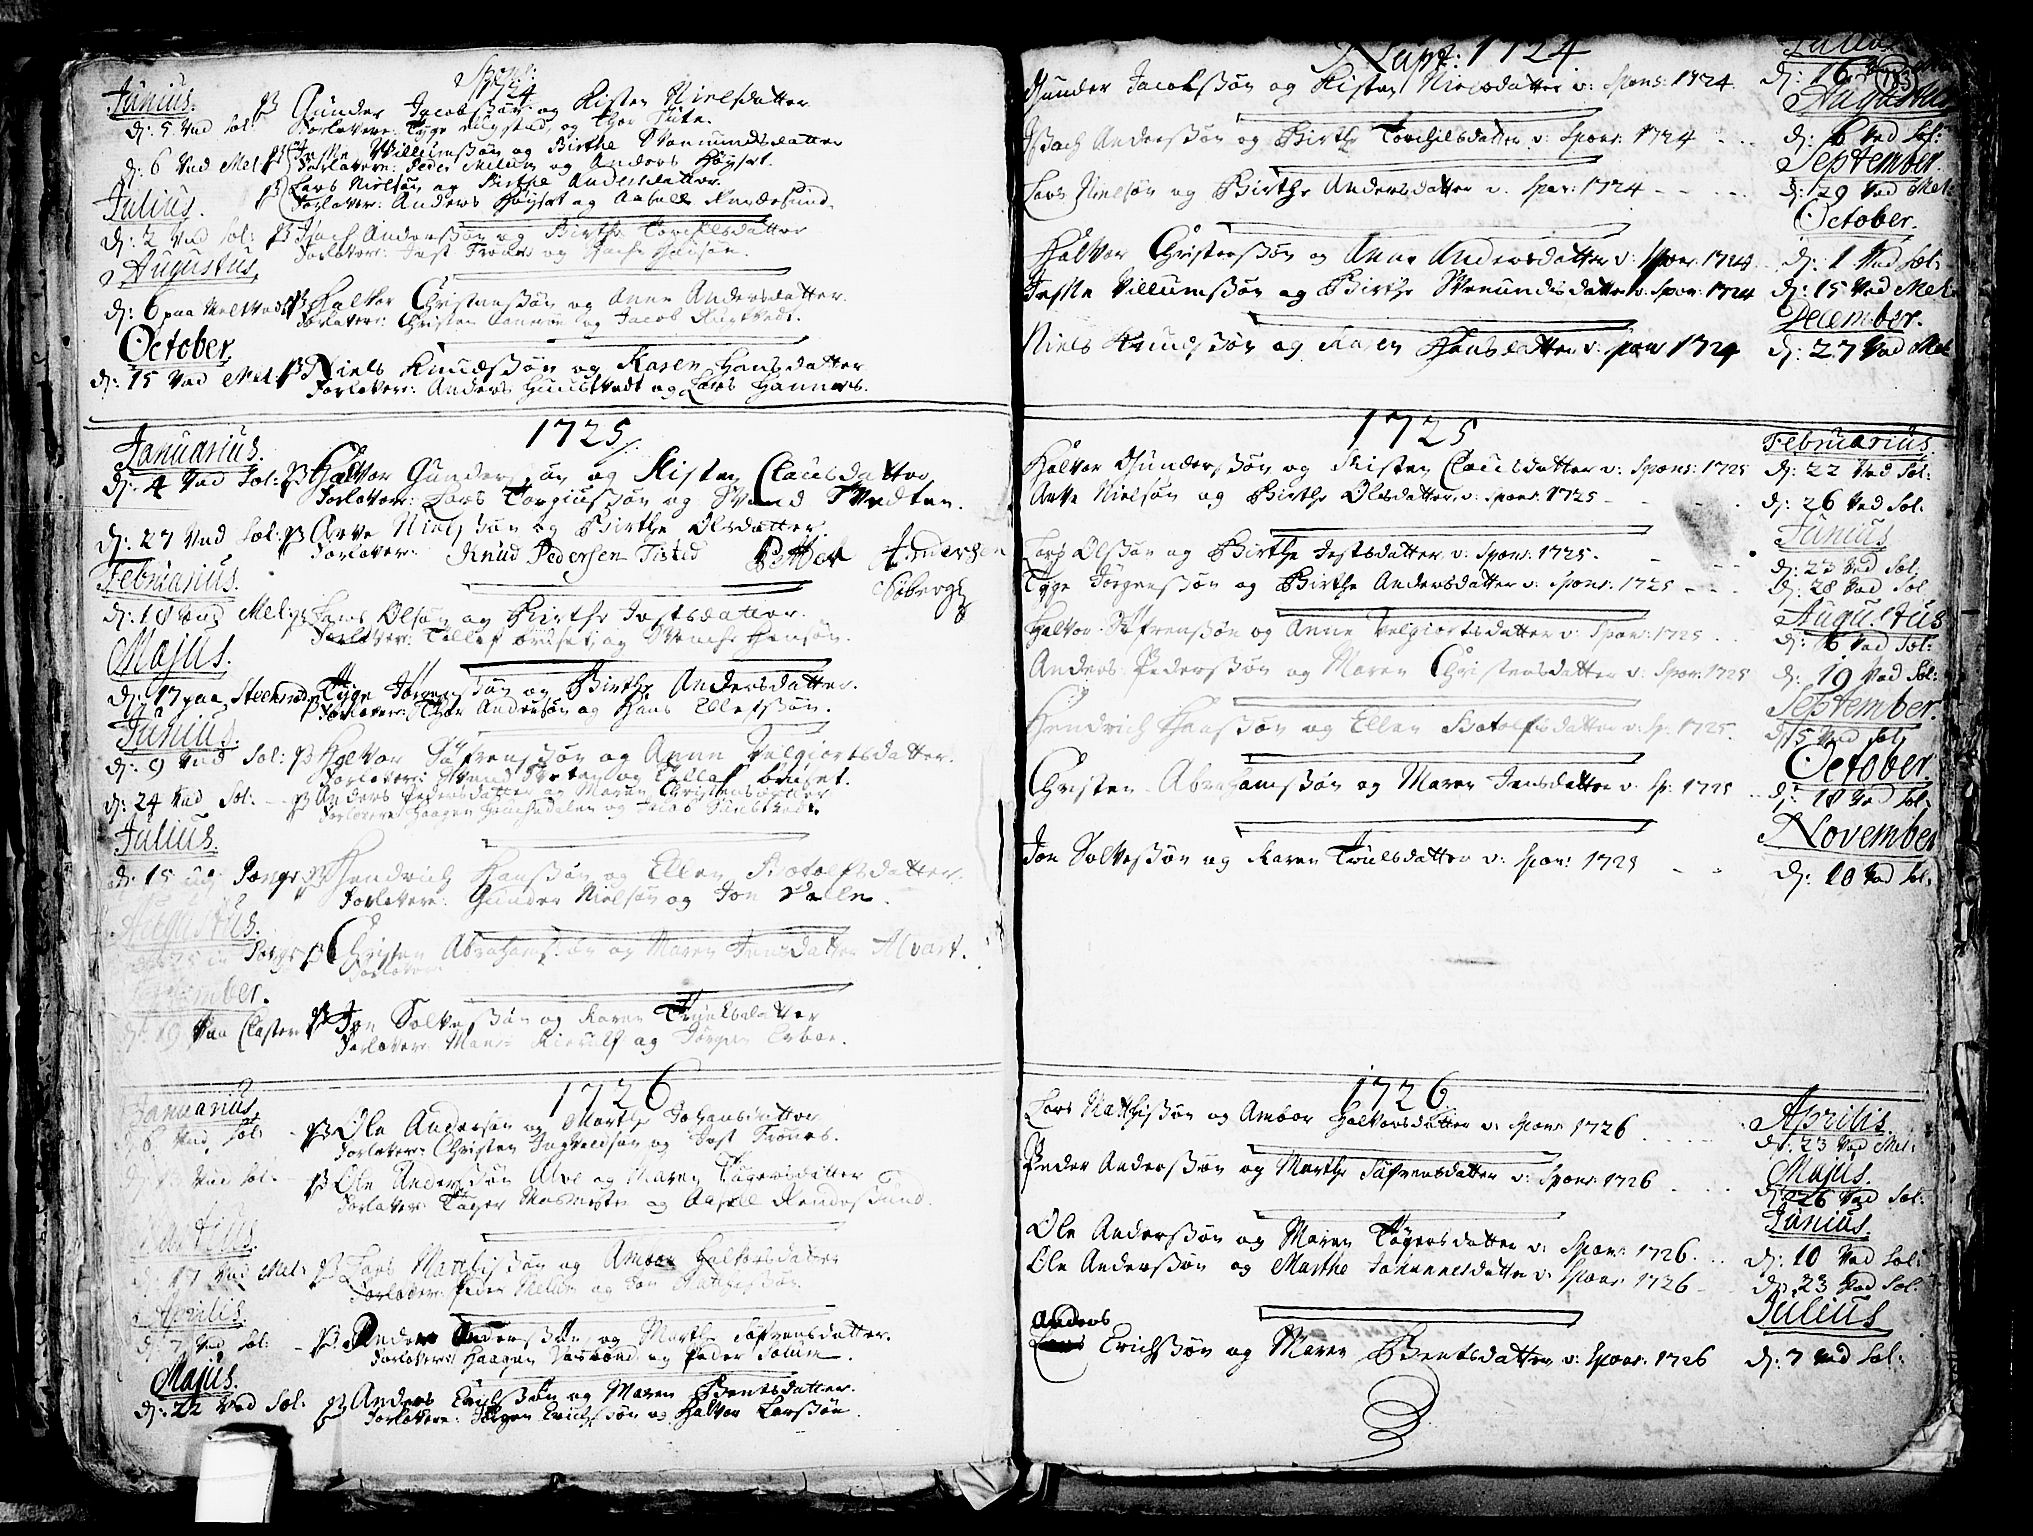 SAKO, Solum kirkebøker, F/Fa/L0002: Ministerialbok nr. I 2, 1713-1761, s. 183